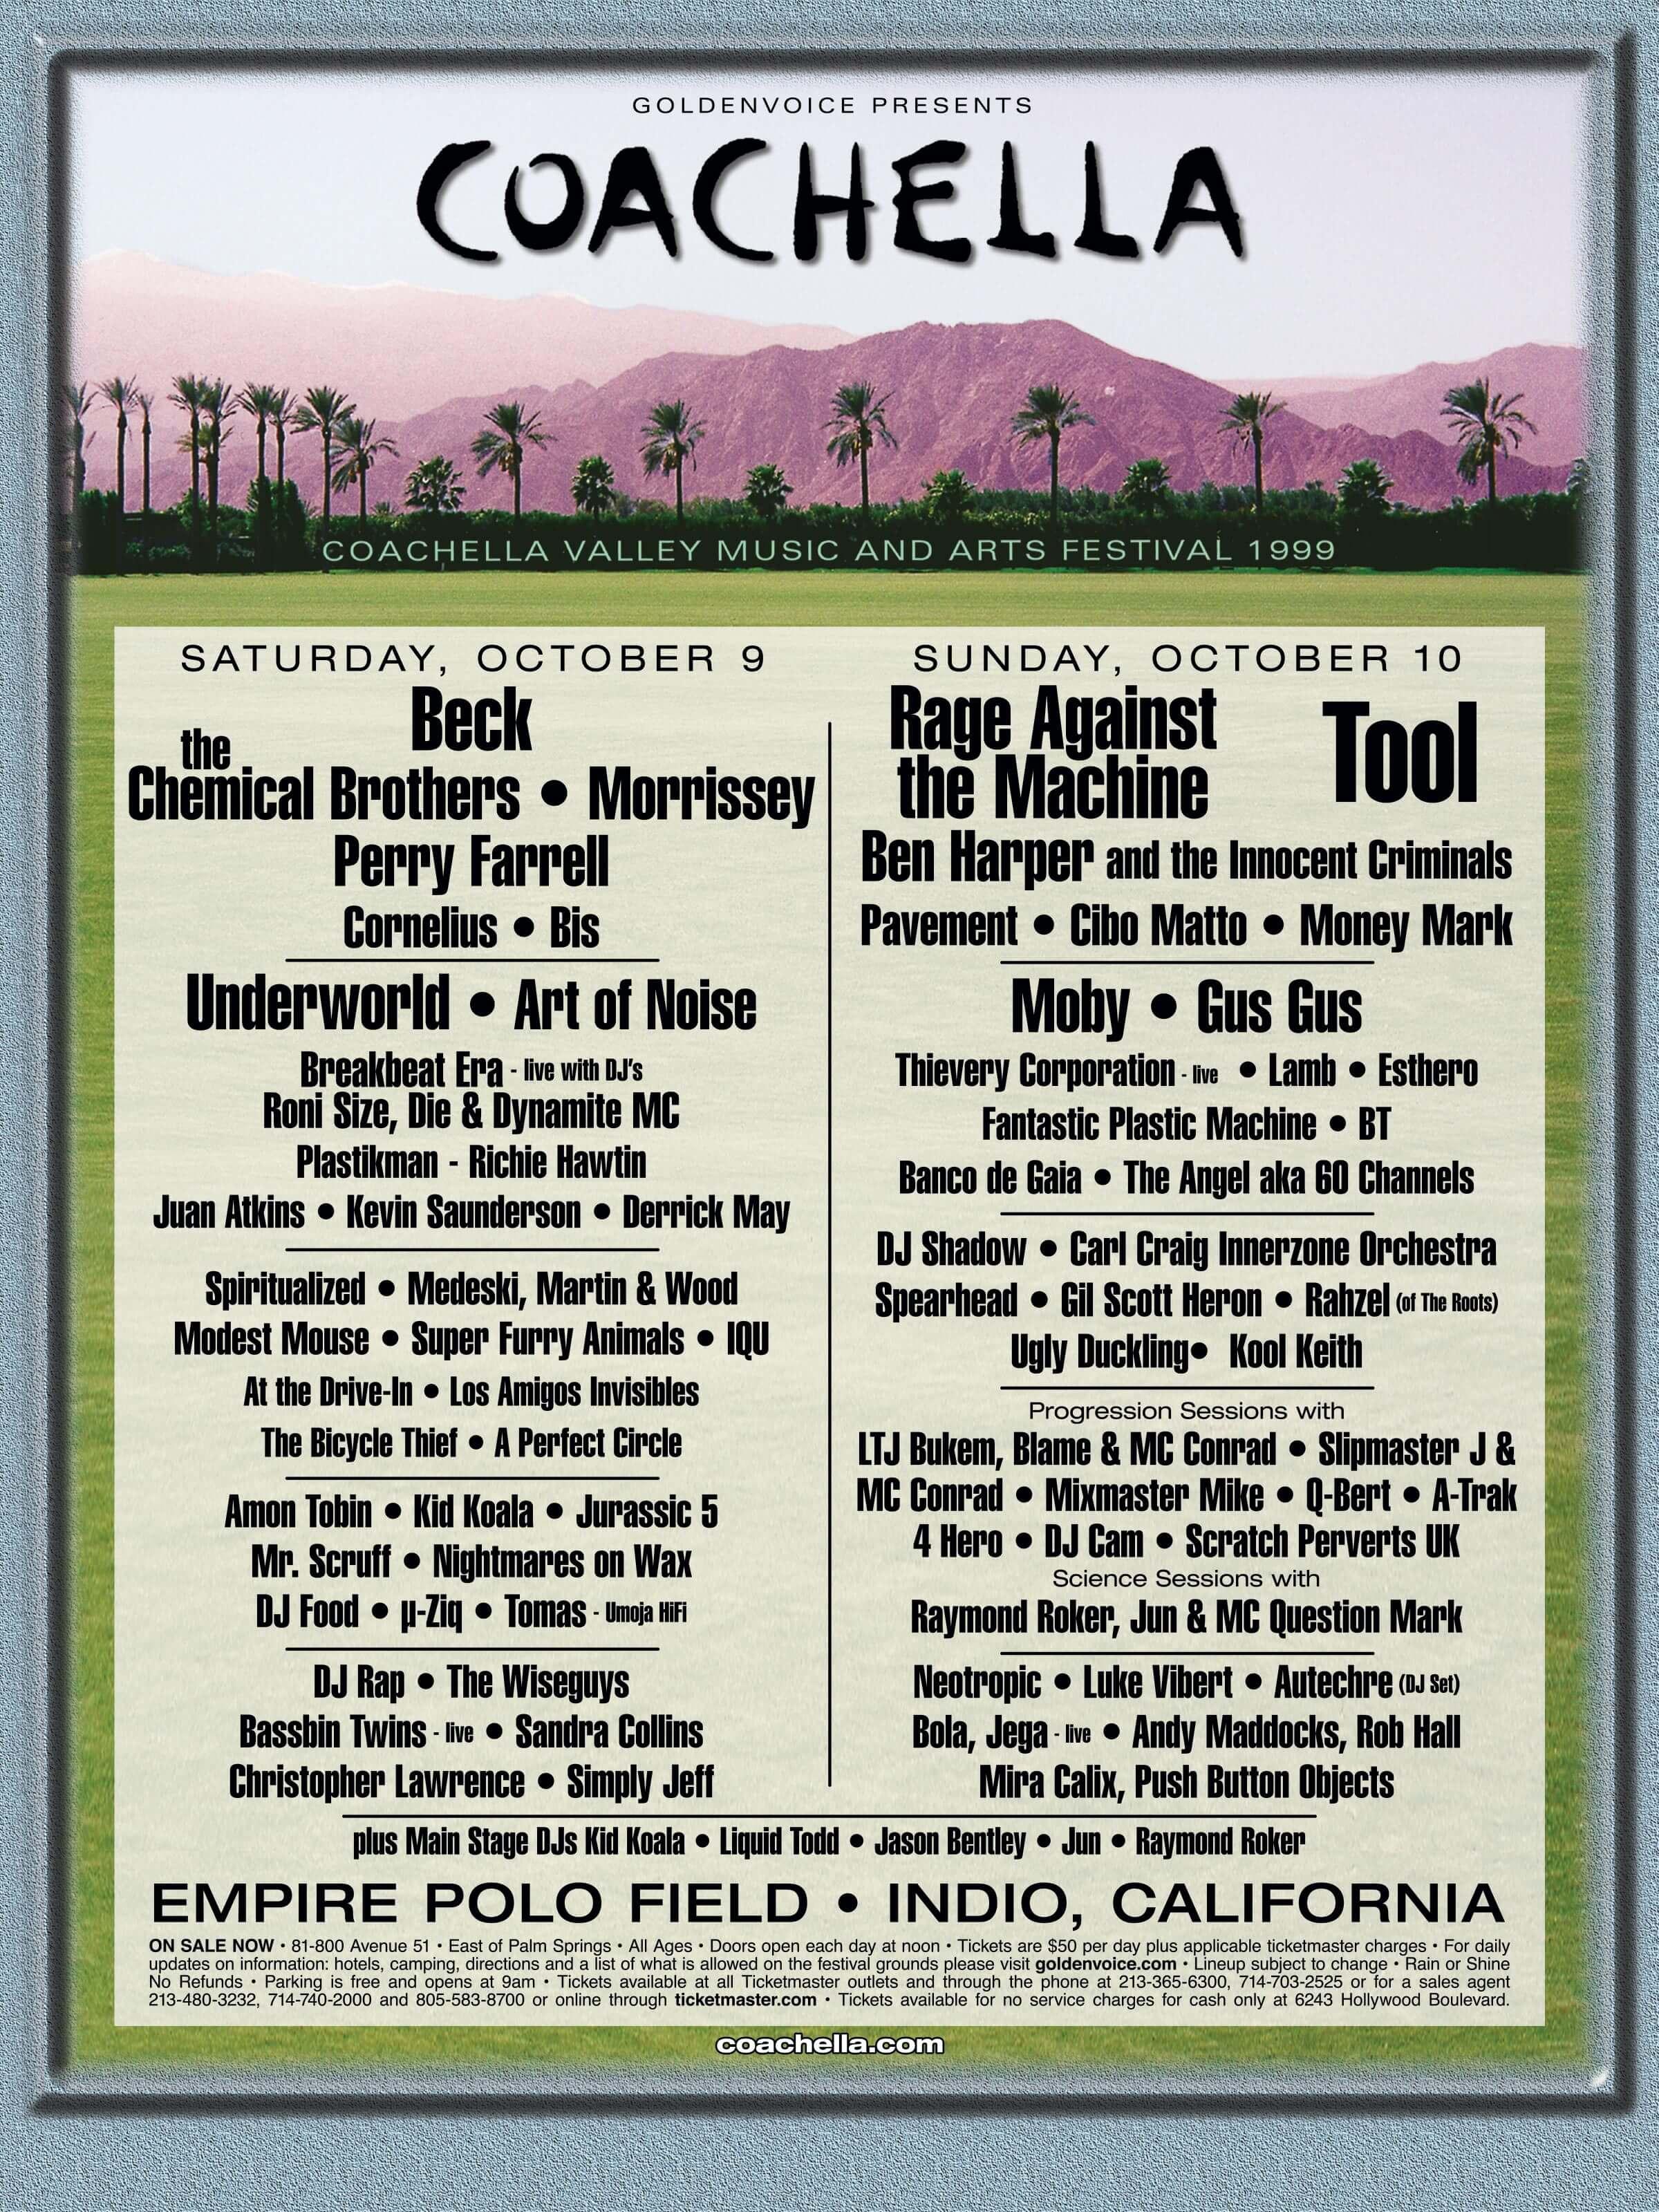 Coachella 1999 Lineup Poster